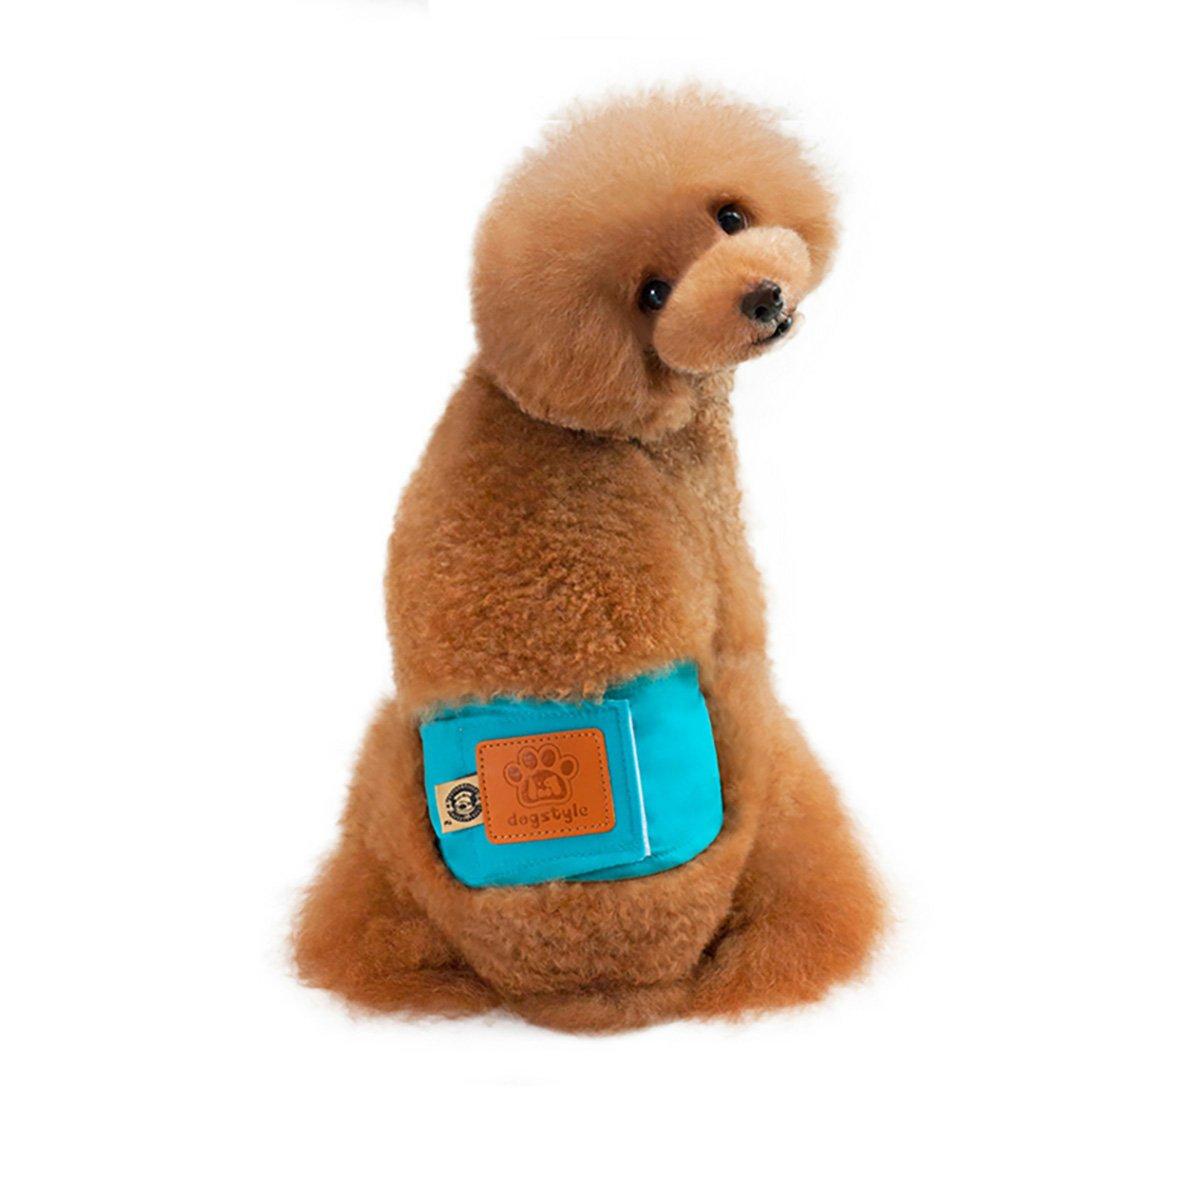 UHeng 4 PCS Male Dog Reusable Wrap Diaper Washable Puppy Belly Band by UHeng (Image #5)